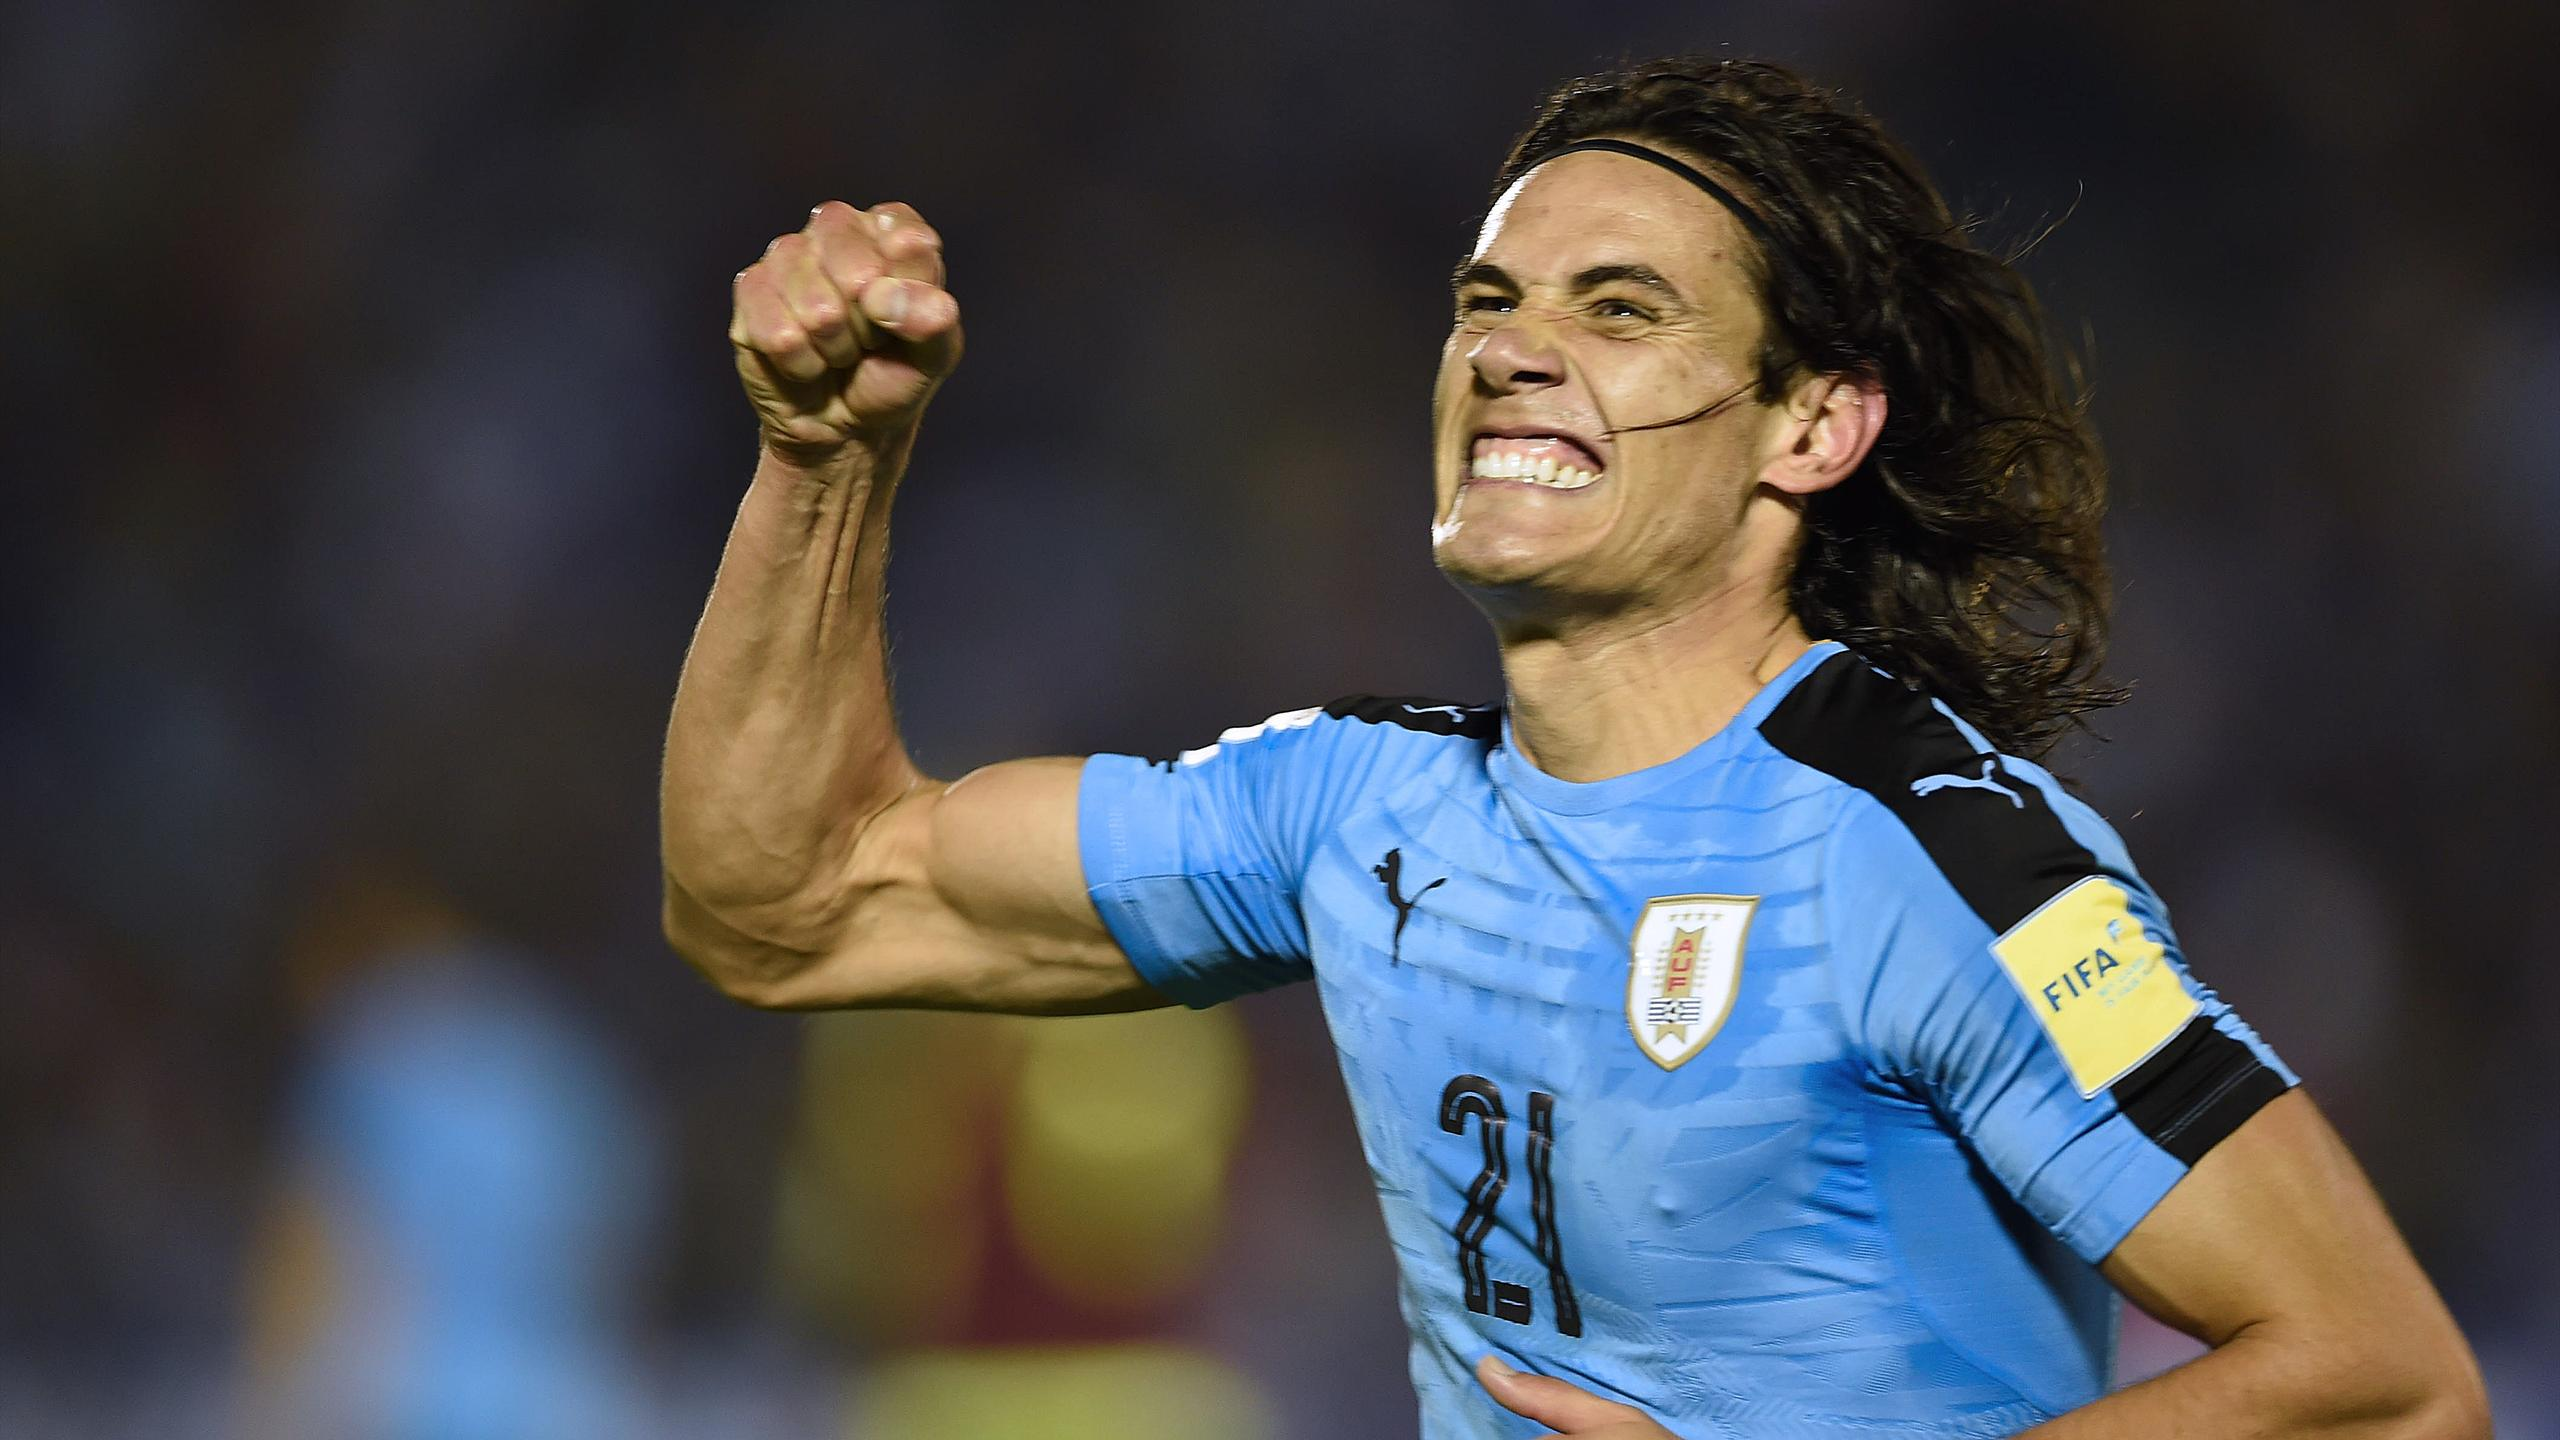 Edinson Cavani - Uruguay - Qualifs Amsud Mondial 2018